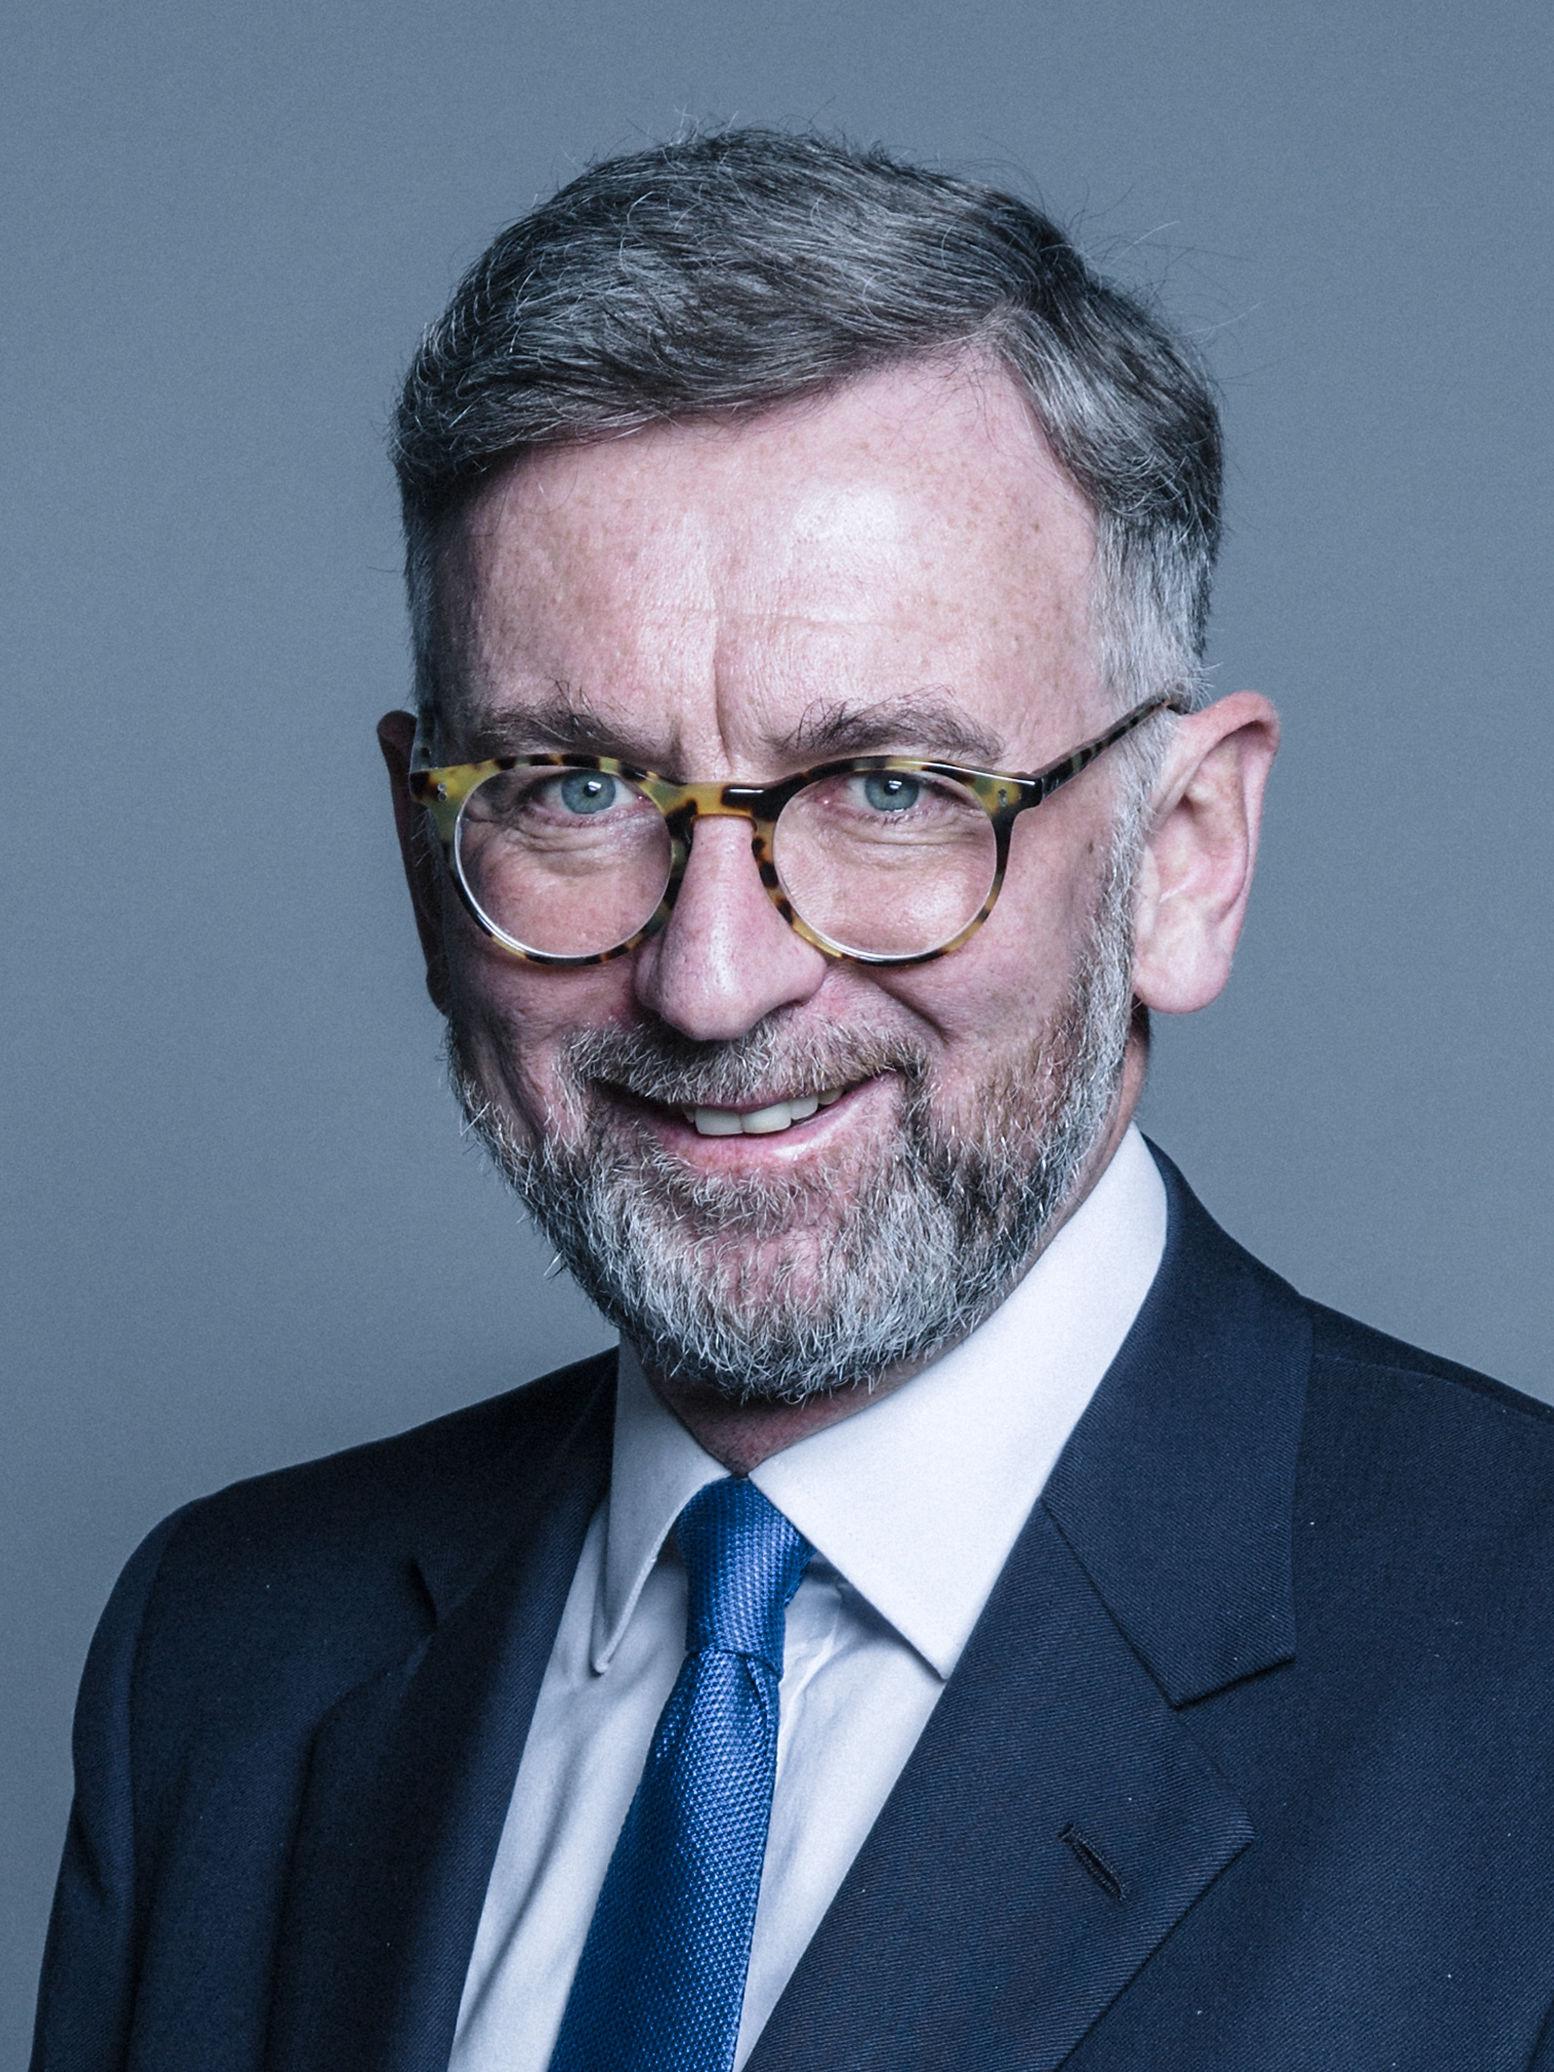 Andrew Dunlop, Baron Dunlop - Wikipedia